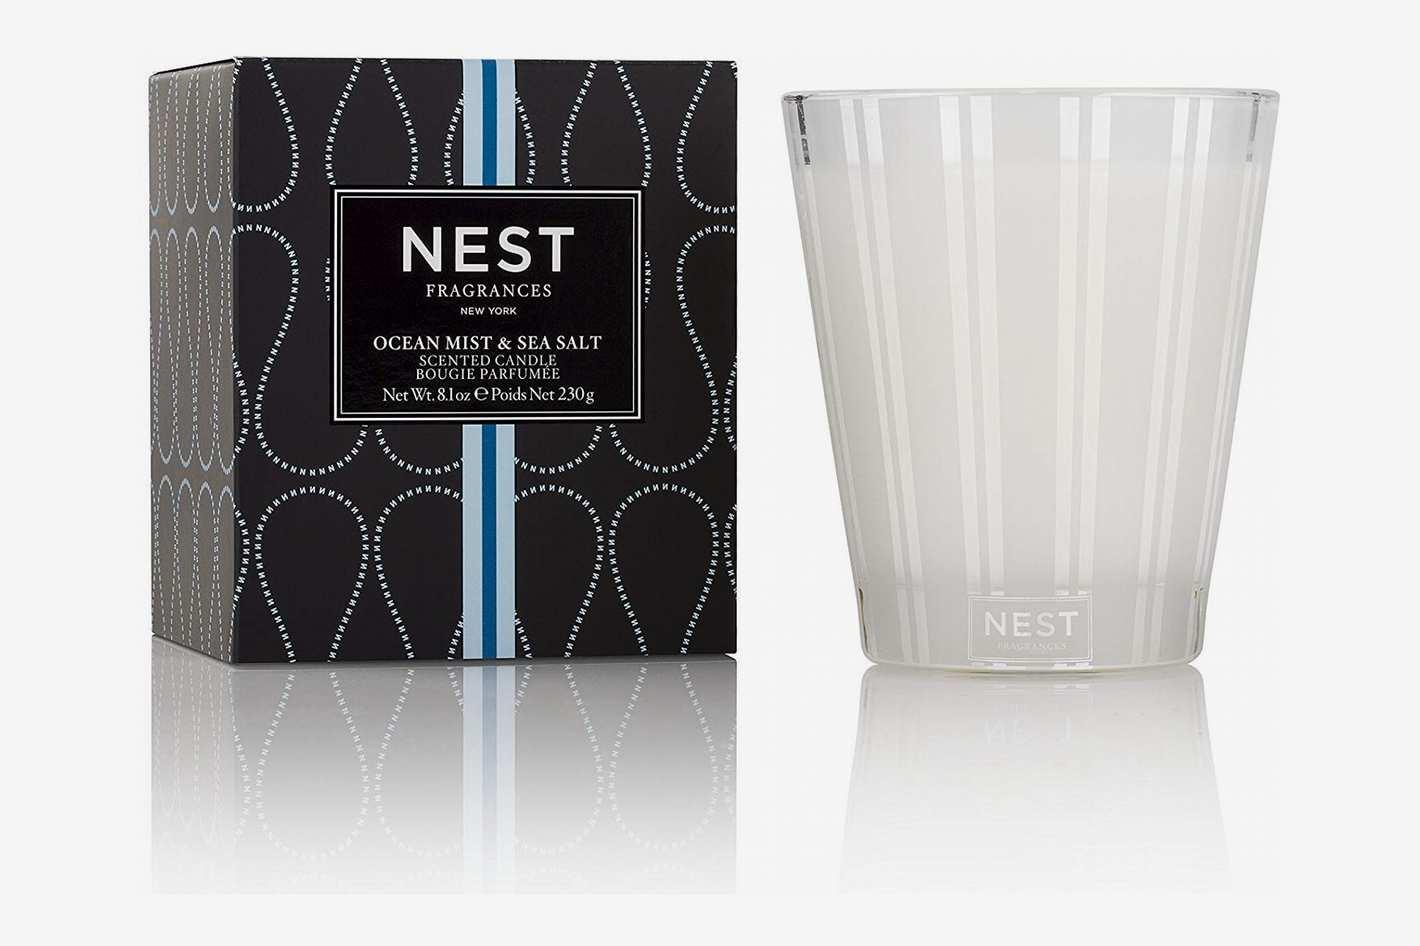 NEST Fragrances Classic Candle in Ocean Mist & Sea Salt